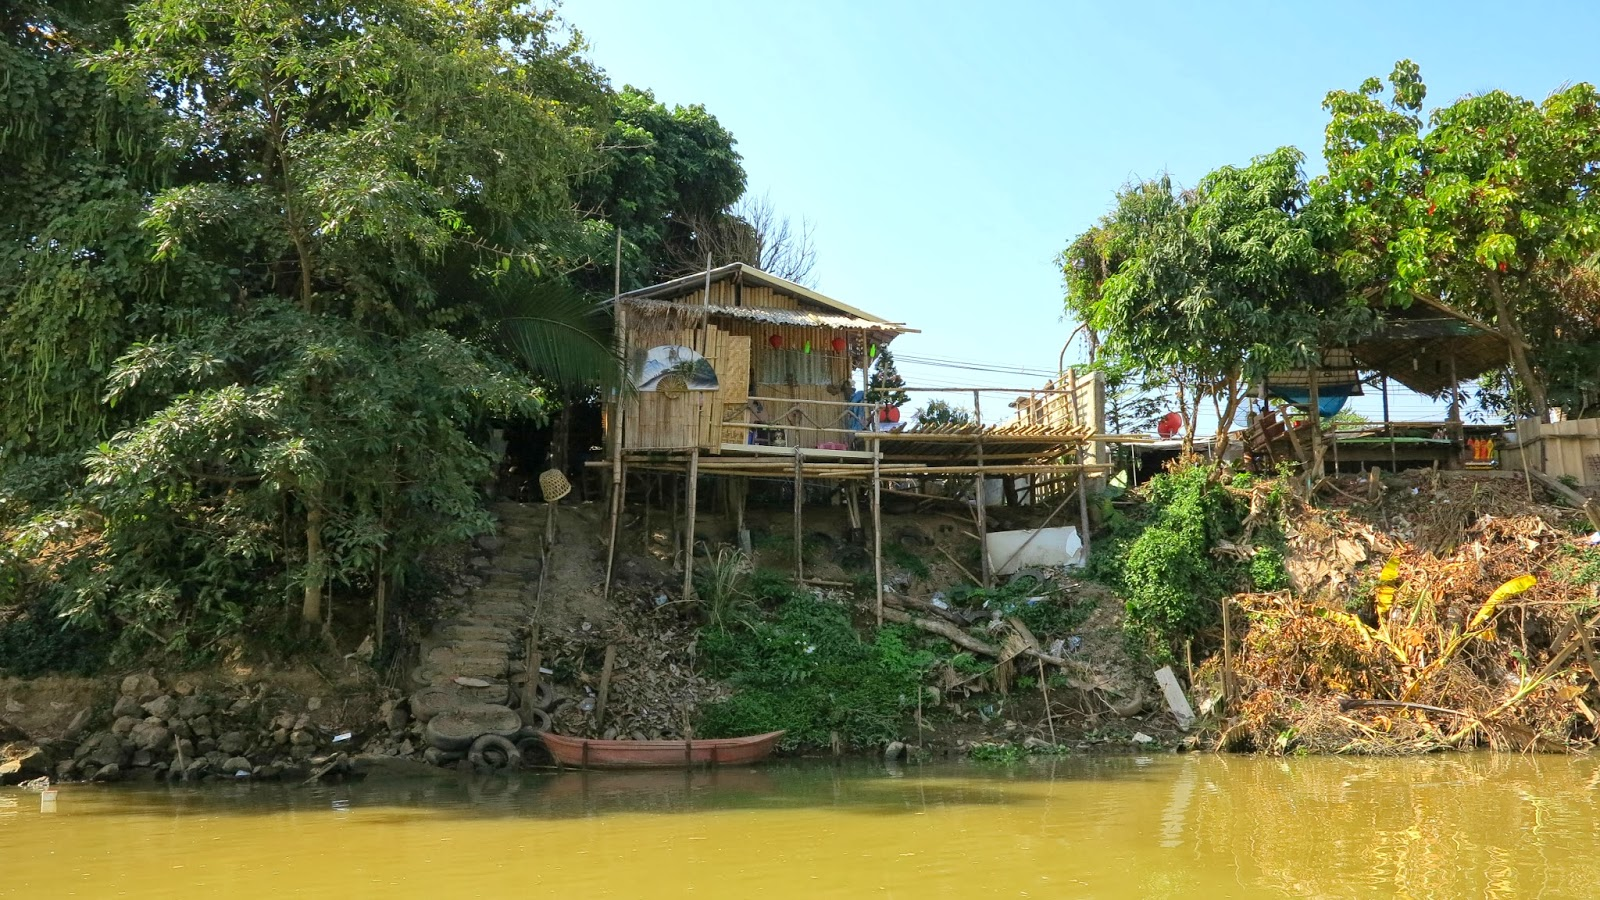 ByHaafner, river Wang Thailand